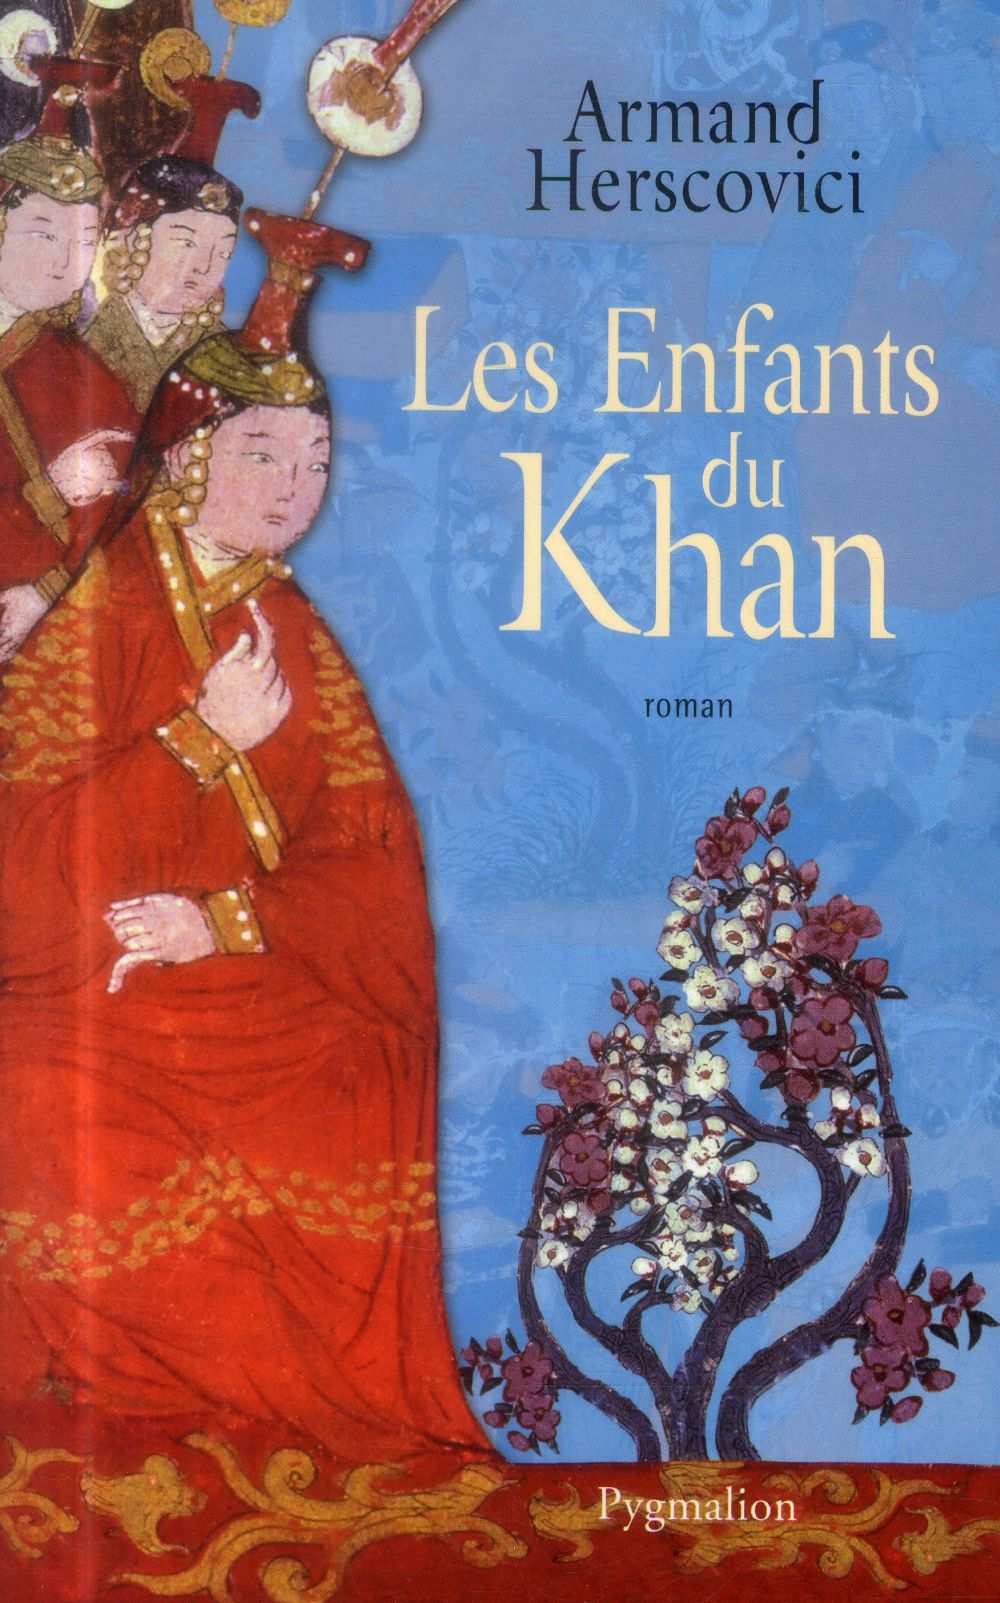 Les enfants du Khan